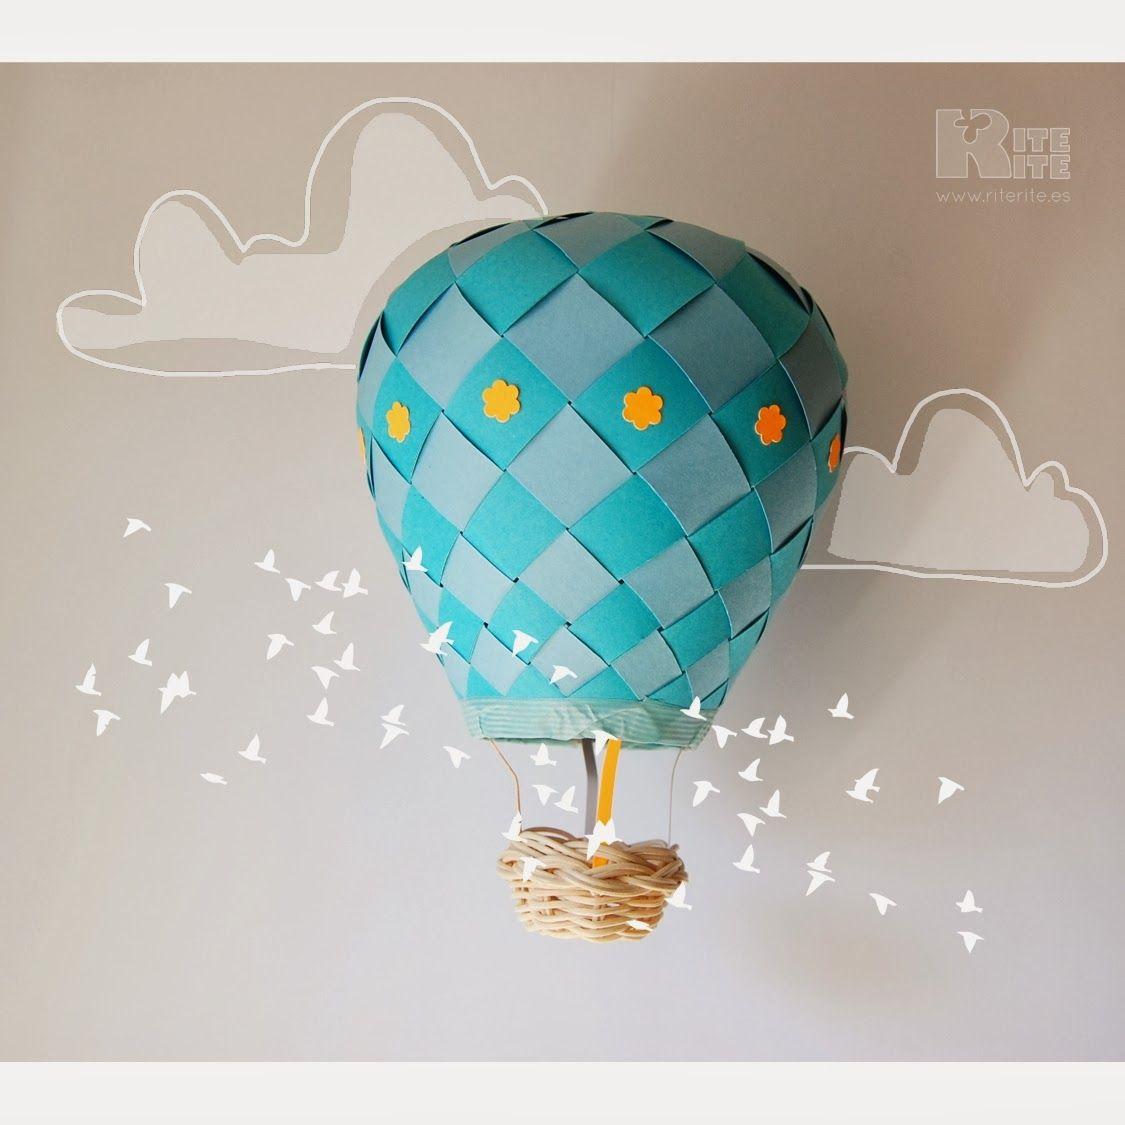 Rite rite globos aerostticos papel decoracin habitacin art rite rite globos aerostticos papel decoracin habitacin design referenceair balloonbaby roomorigamikids jeuxipadfo Choice Image